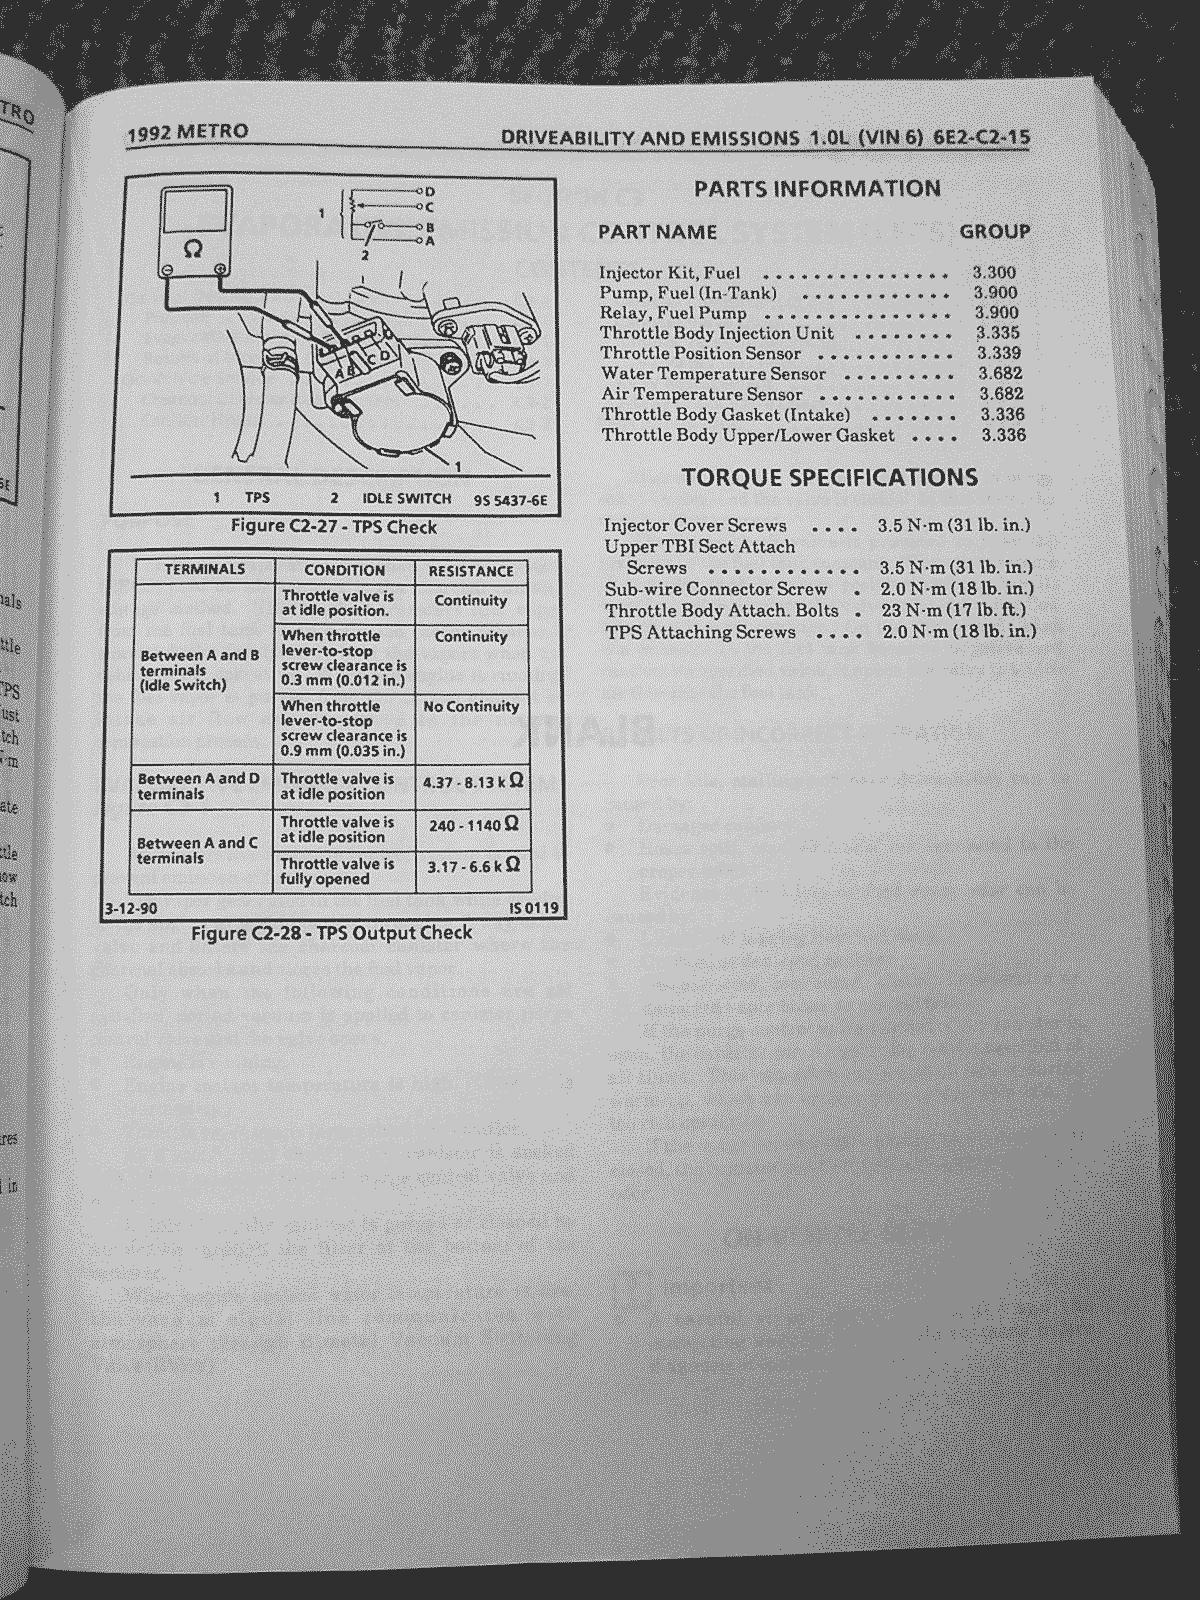 40 Suzuki Swift Gti Wiring Diagram   Car Engine Diagram 40 40 40 ...